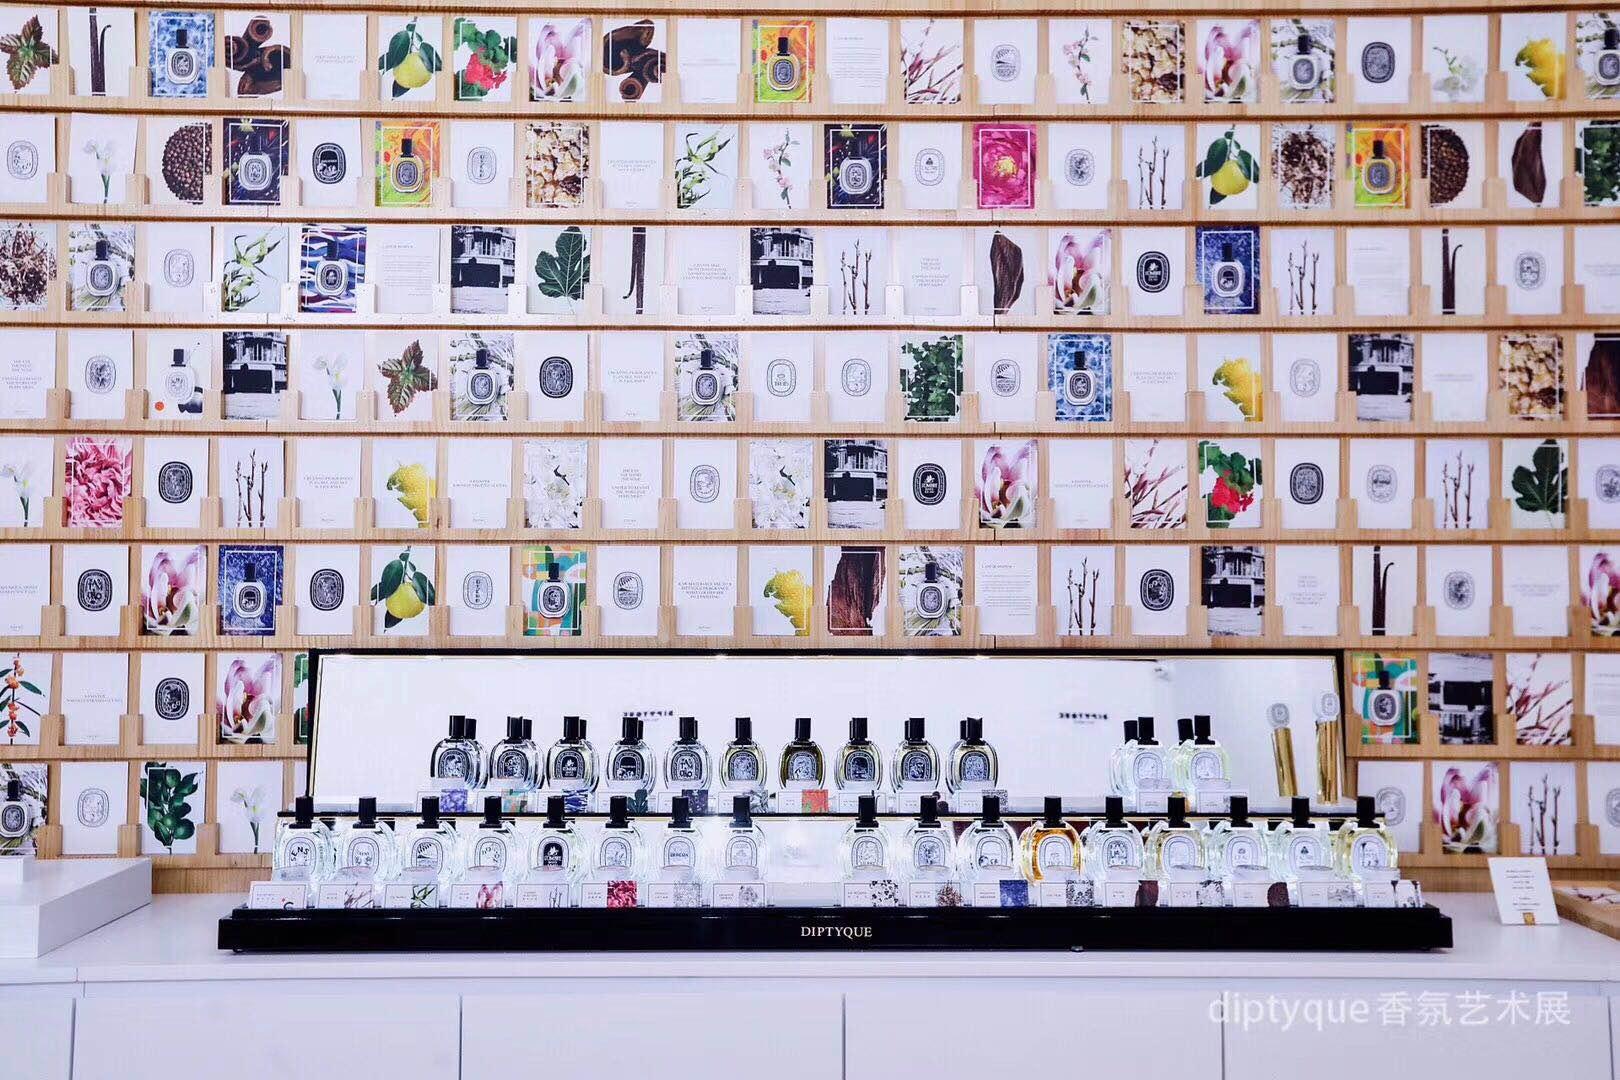 Diptyque Cha House Pop Up Store April 2019 Shanghai – 4